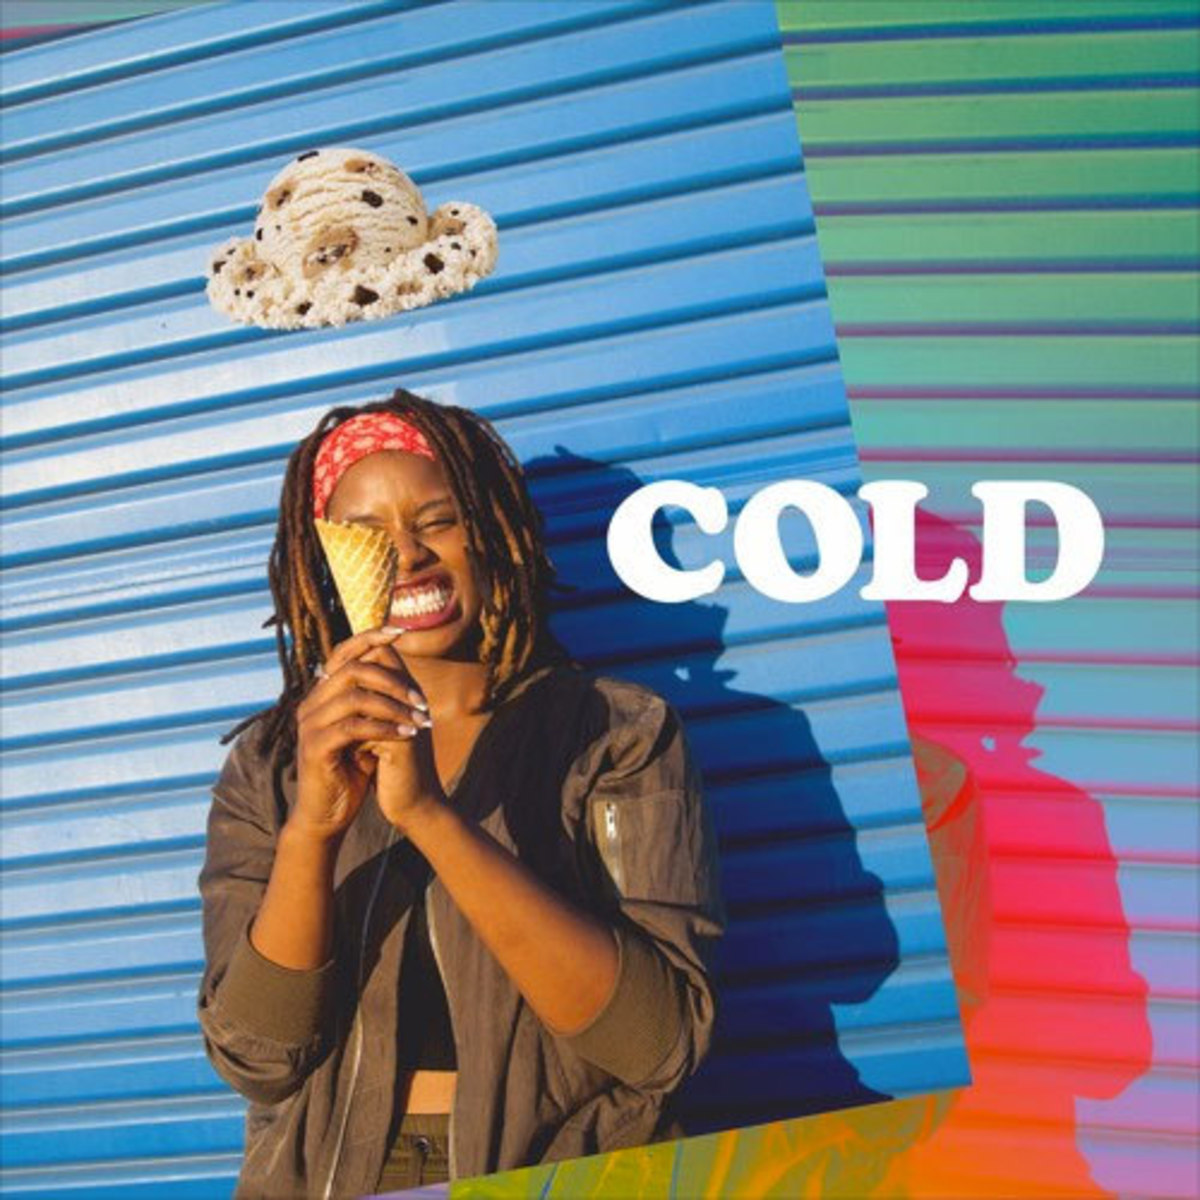 pj-cold.jpg